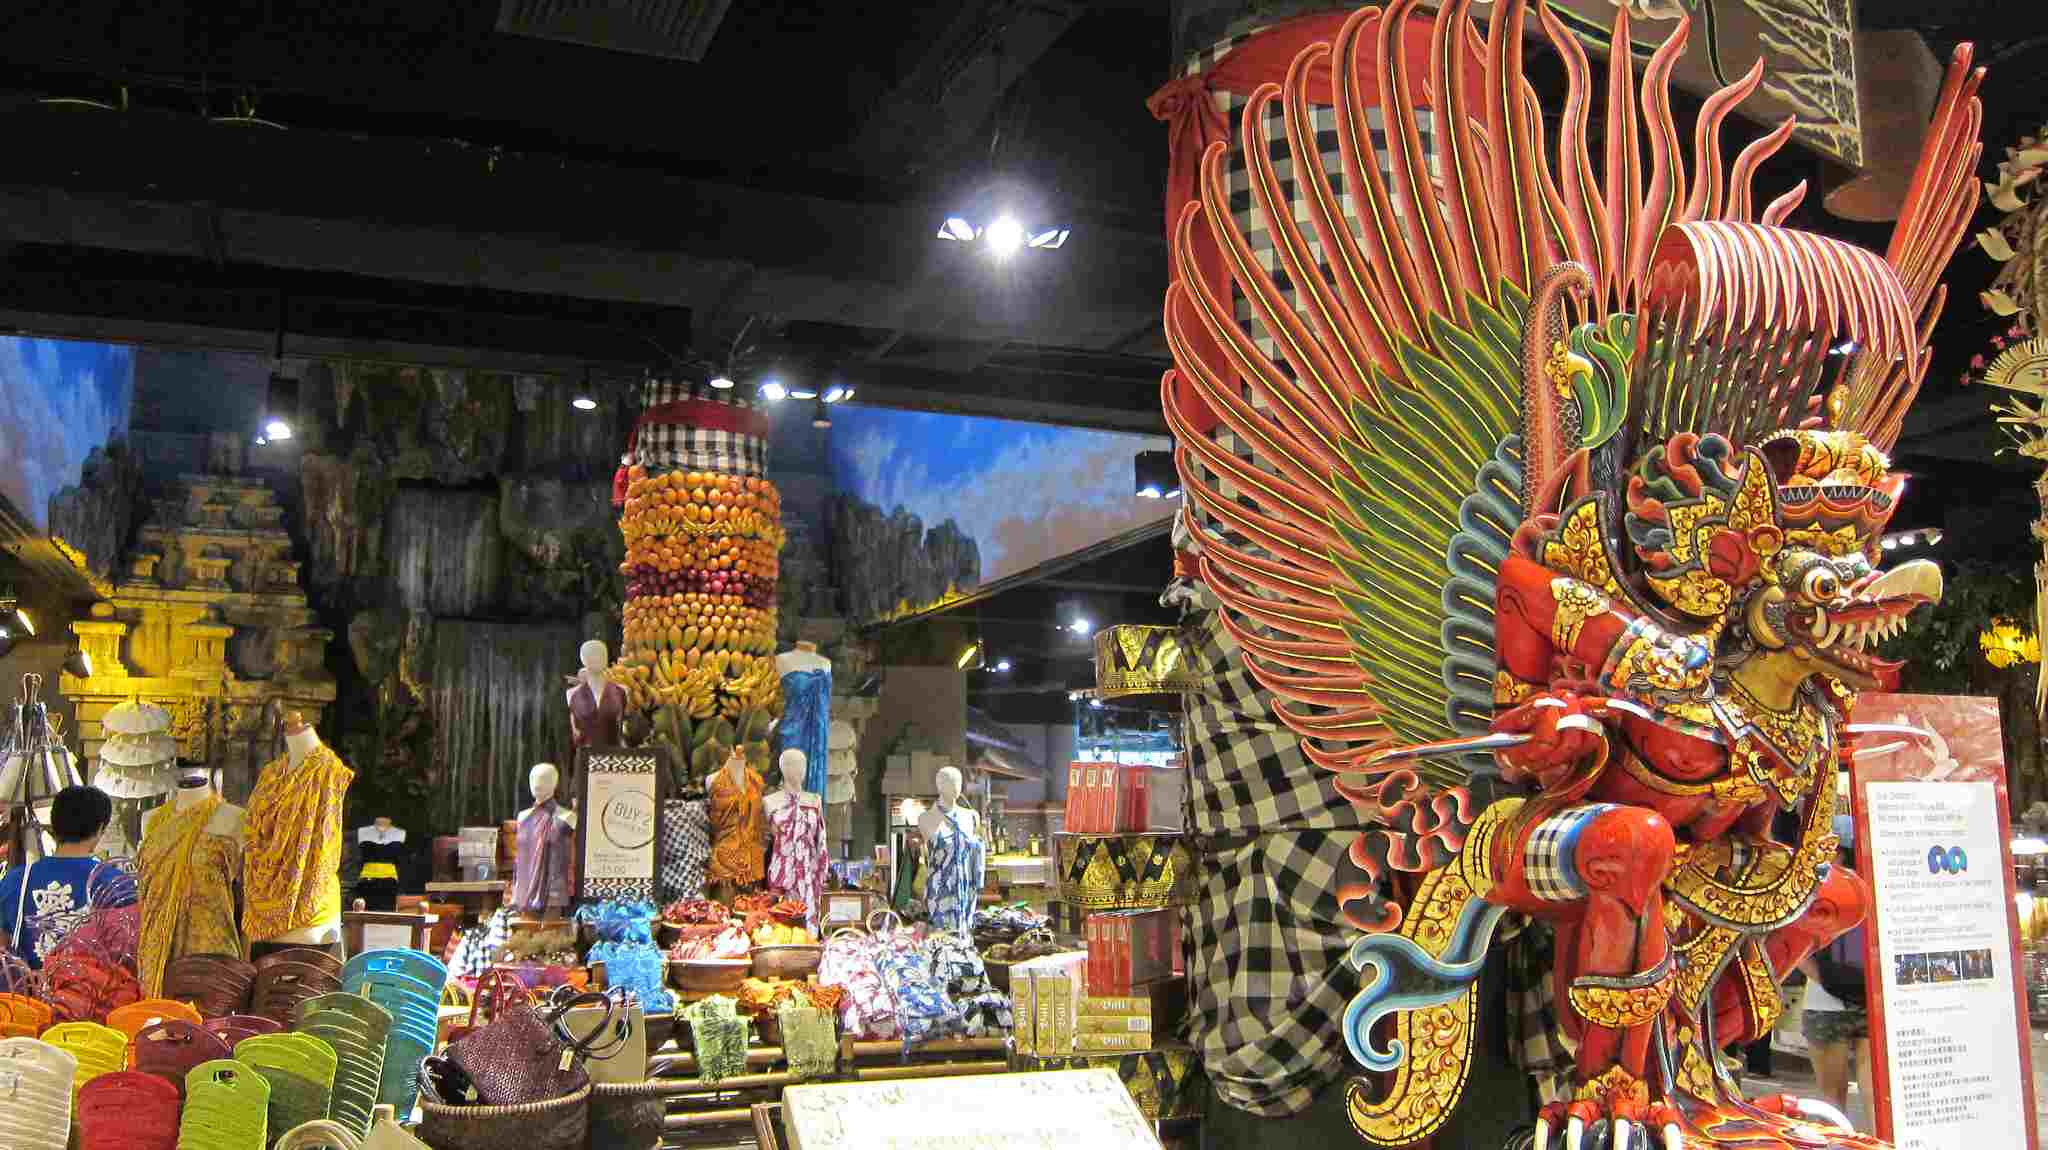 T Galleria by DFS interior, Bali, Indonesia